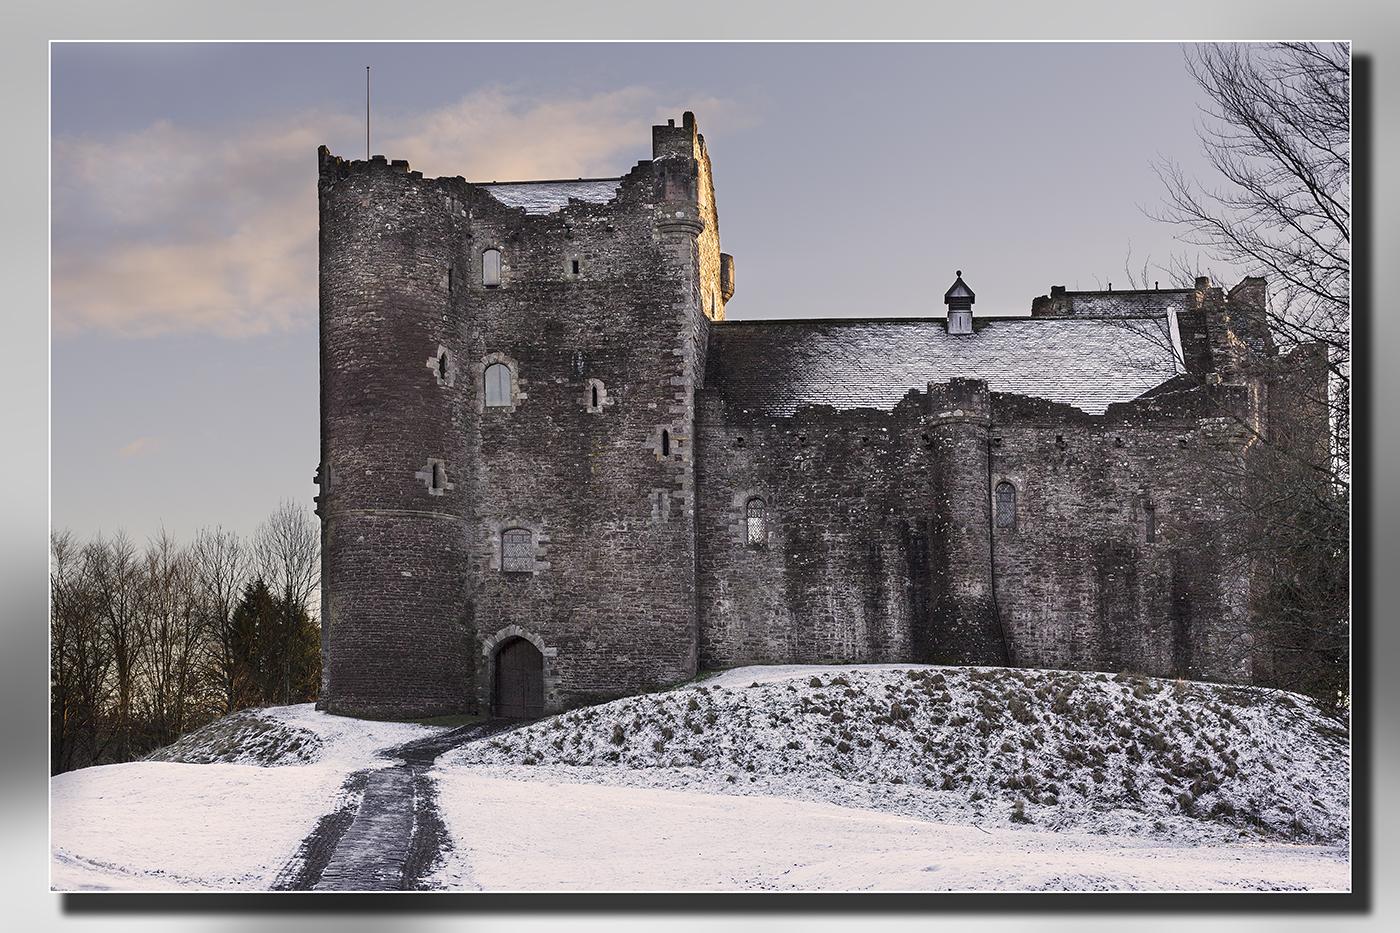 Bill McKenzie - Doune Castle in Snow